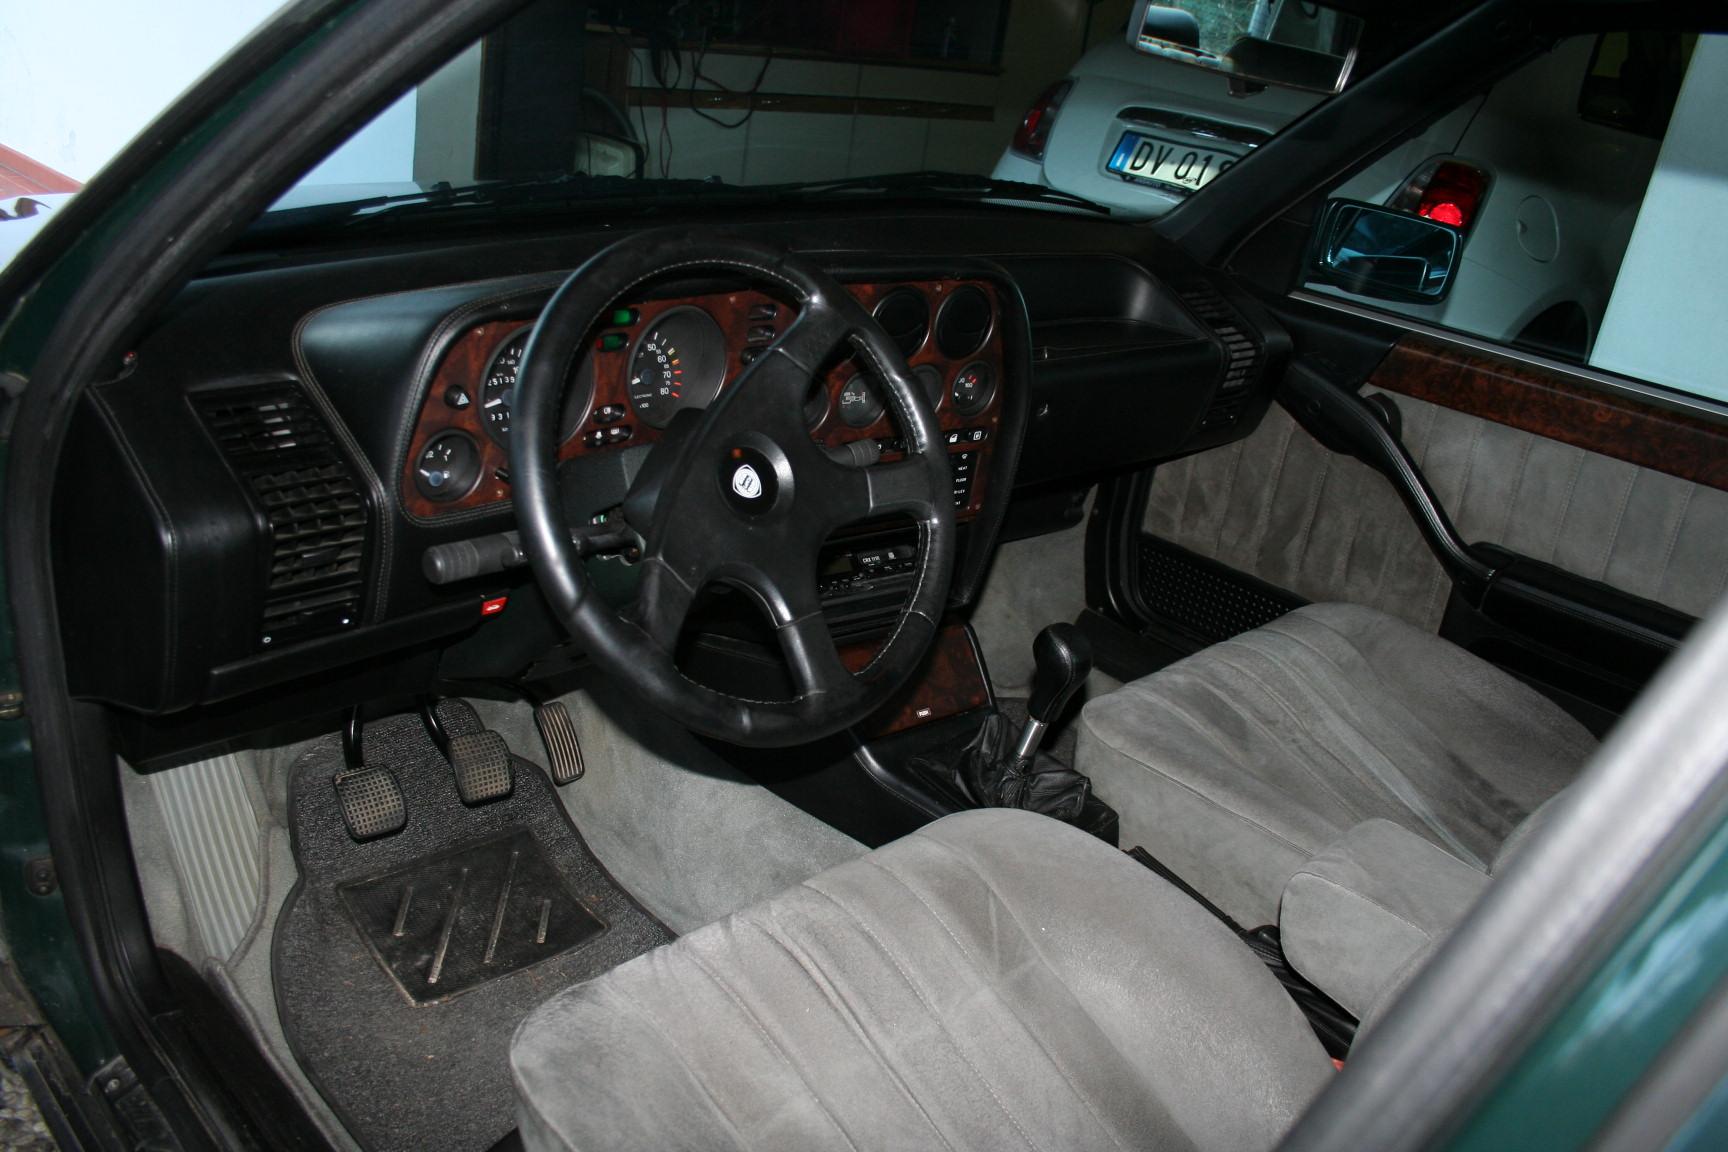 Lancia Delta Interior View furthermore Fulvia Electrics Upper Right I U further Interni Nuova Lancia Flavia Cabrilet Motor Show Italiantestdriver additionally Lancia Ypsilon X D Ec further Lancia Lybra Obd Connector. on lancia thema 2011